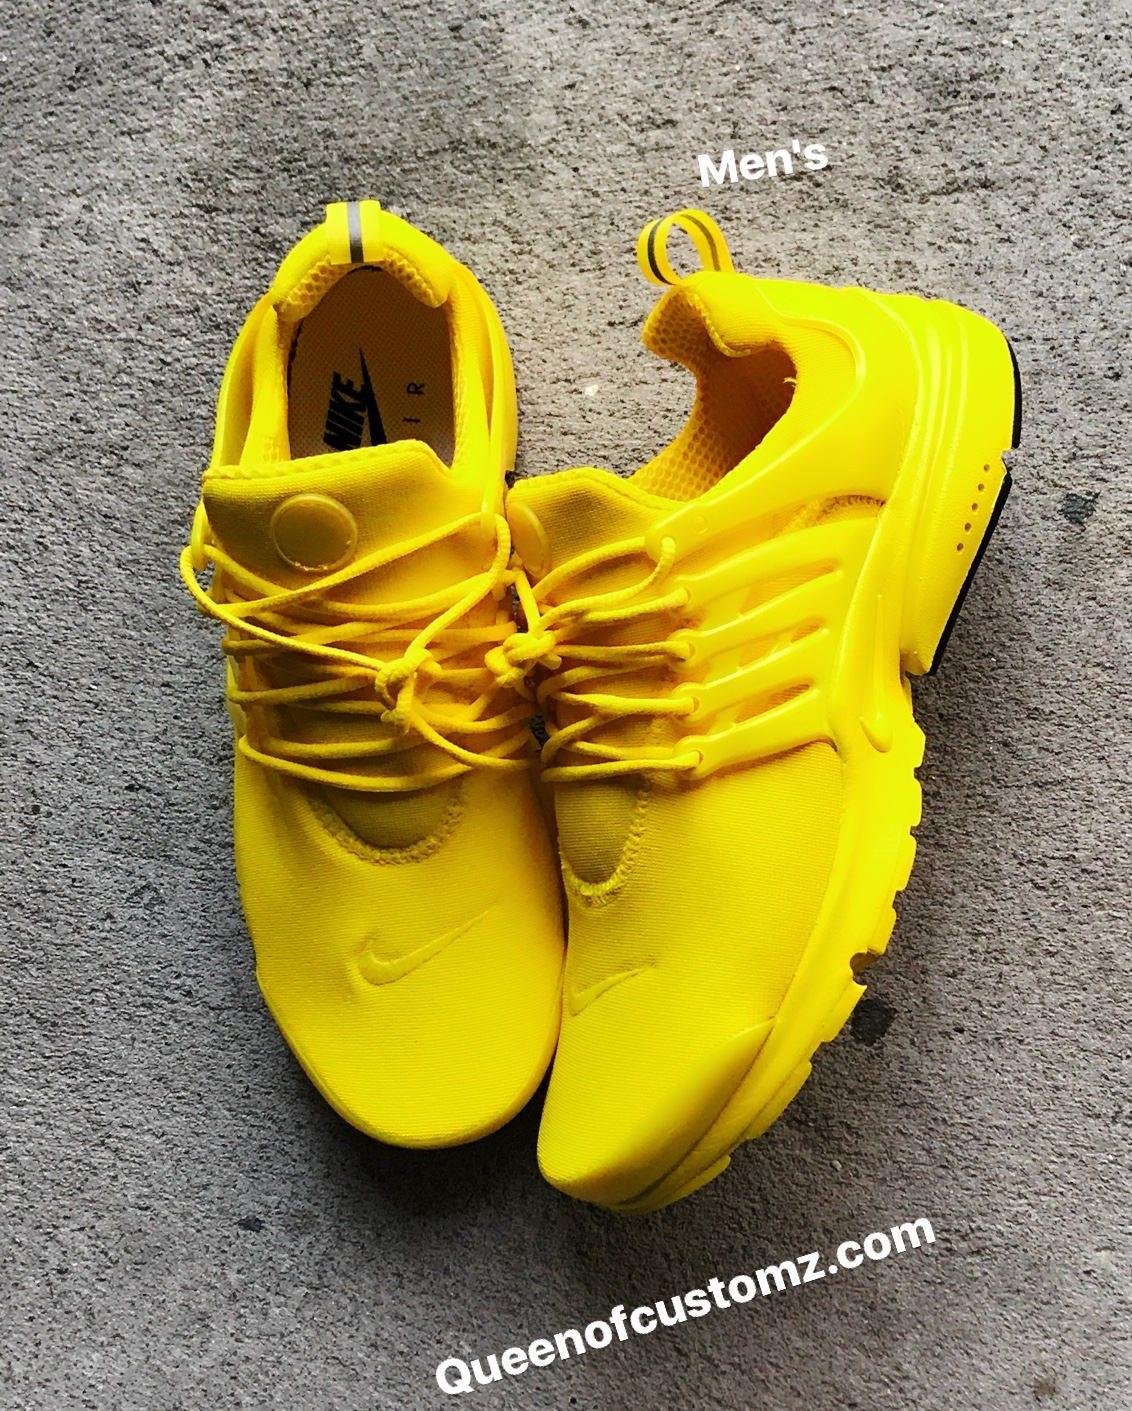 new products dcc37 090b9 Sunshine Yellow Nike Presto Custom (PLEASE READ DESCRIPTION)